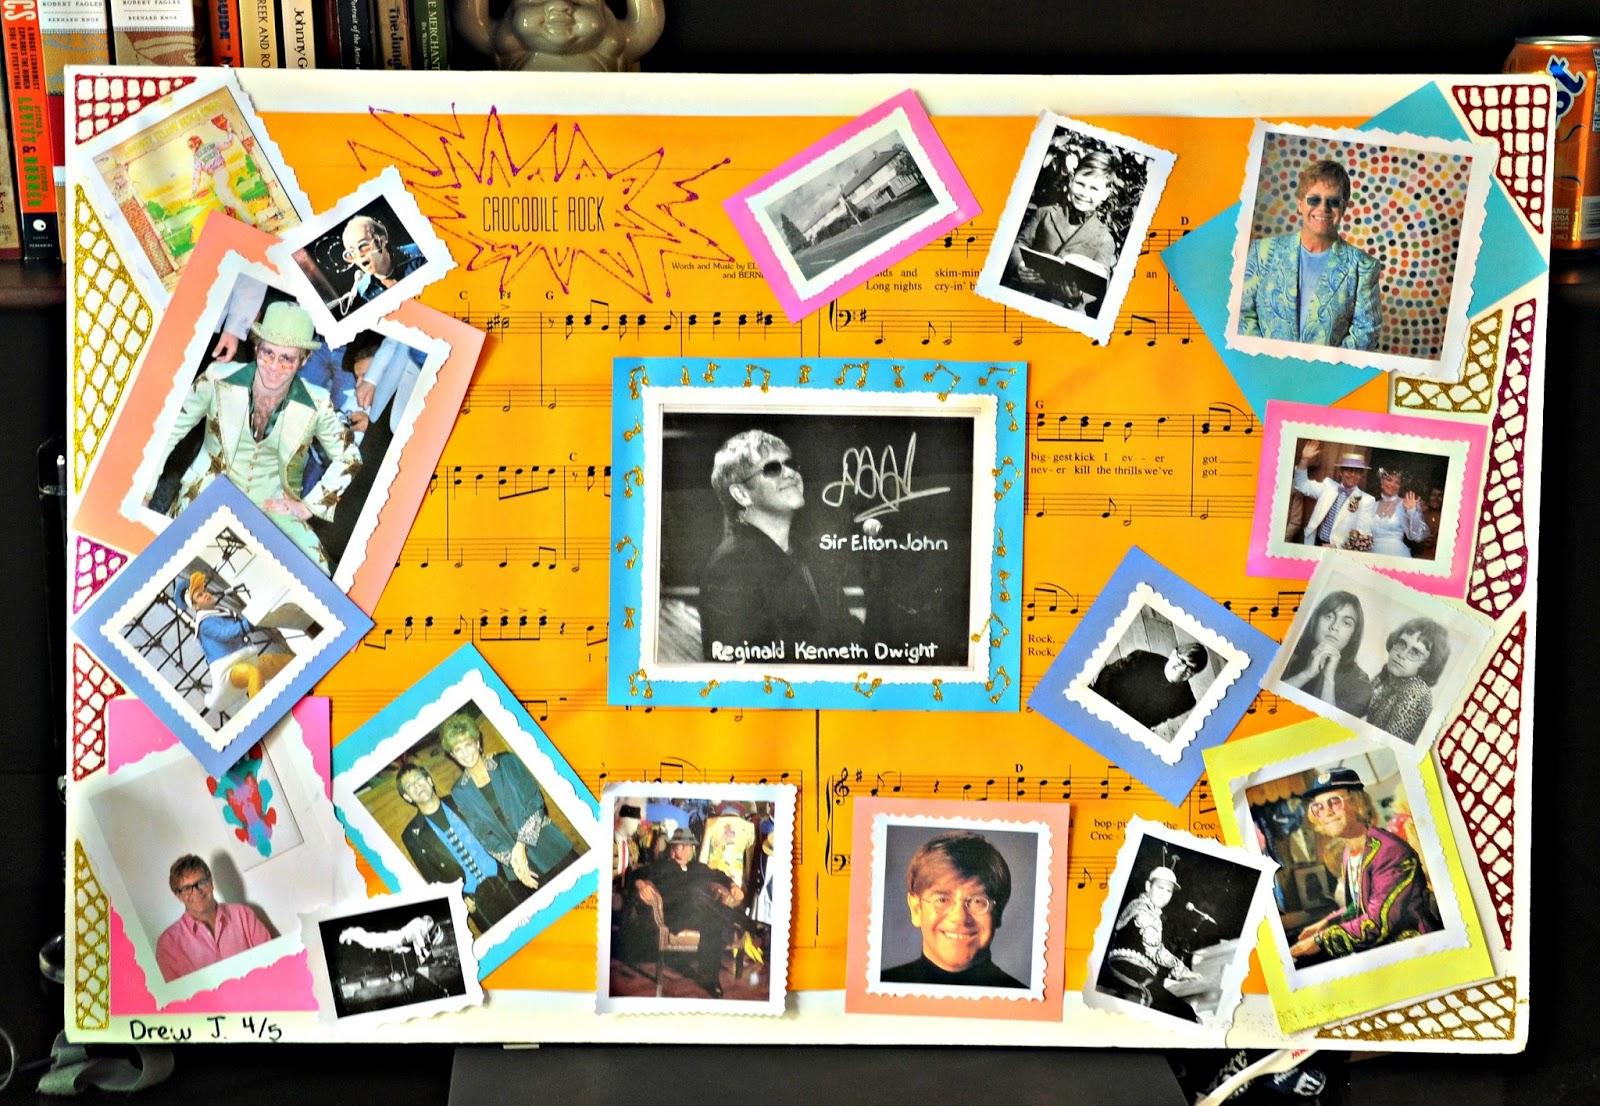 Creative poster board ideas for school project for Creative poster board ideas